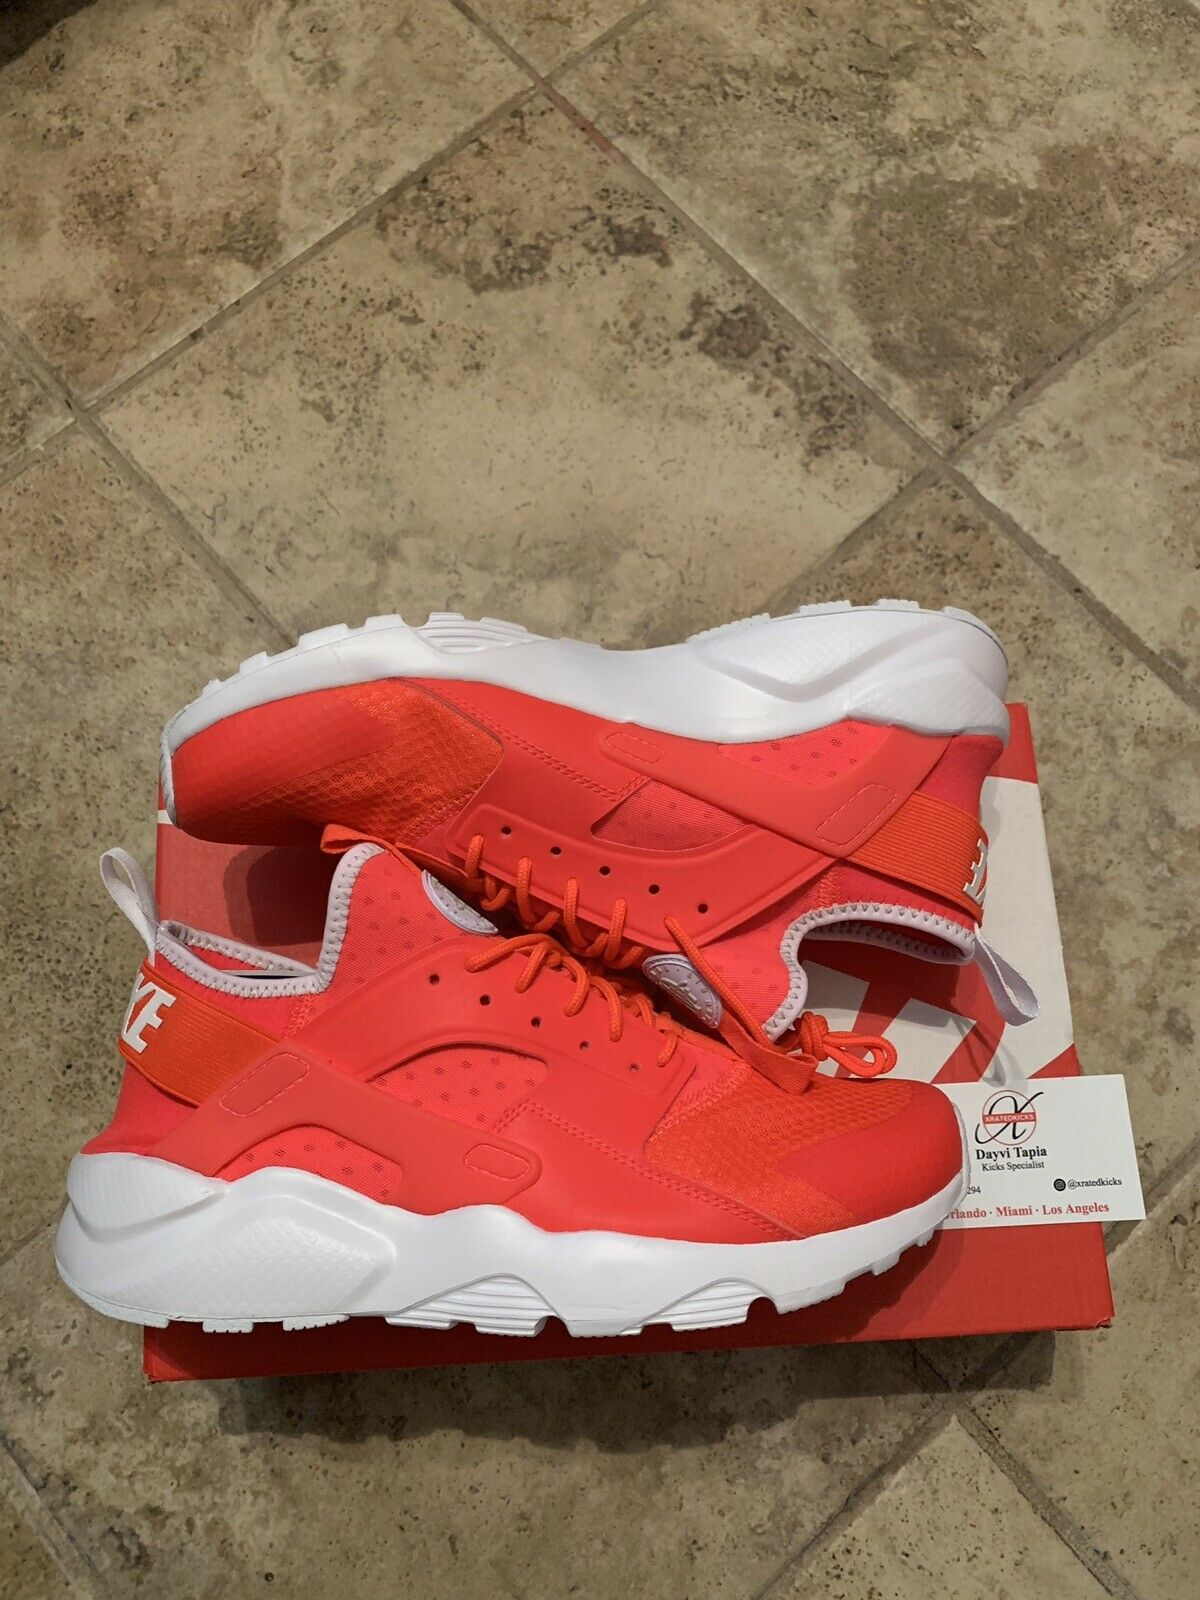 Nike herr Air Huarache Kör Ultra Crimson vit män män män Storlek 9  snabba svar